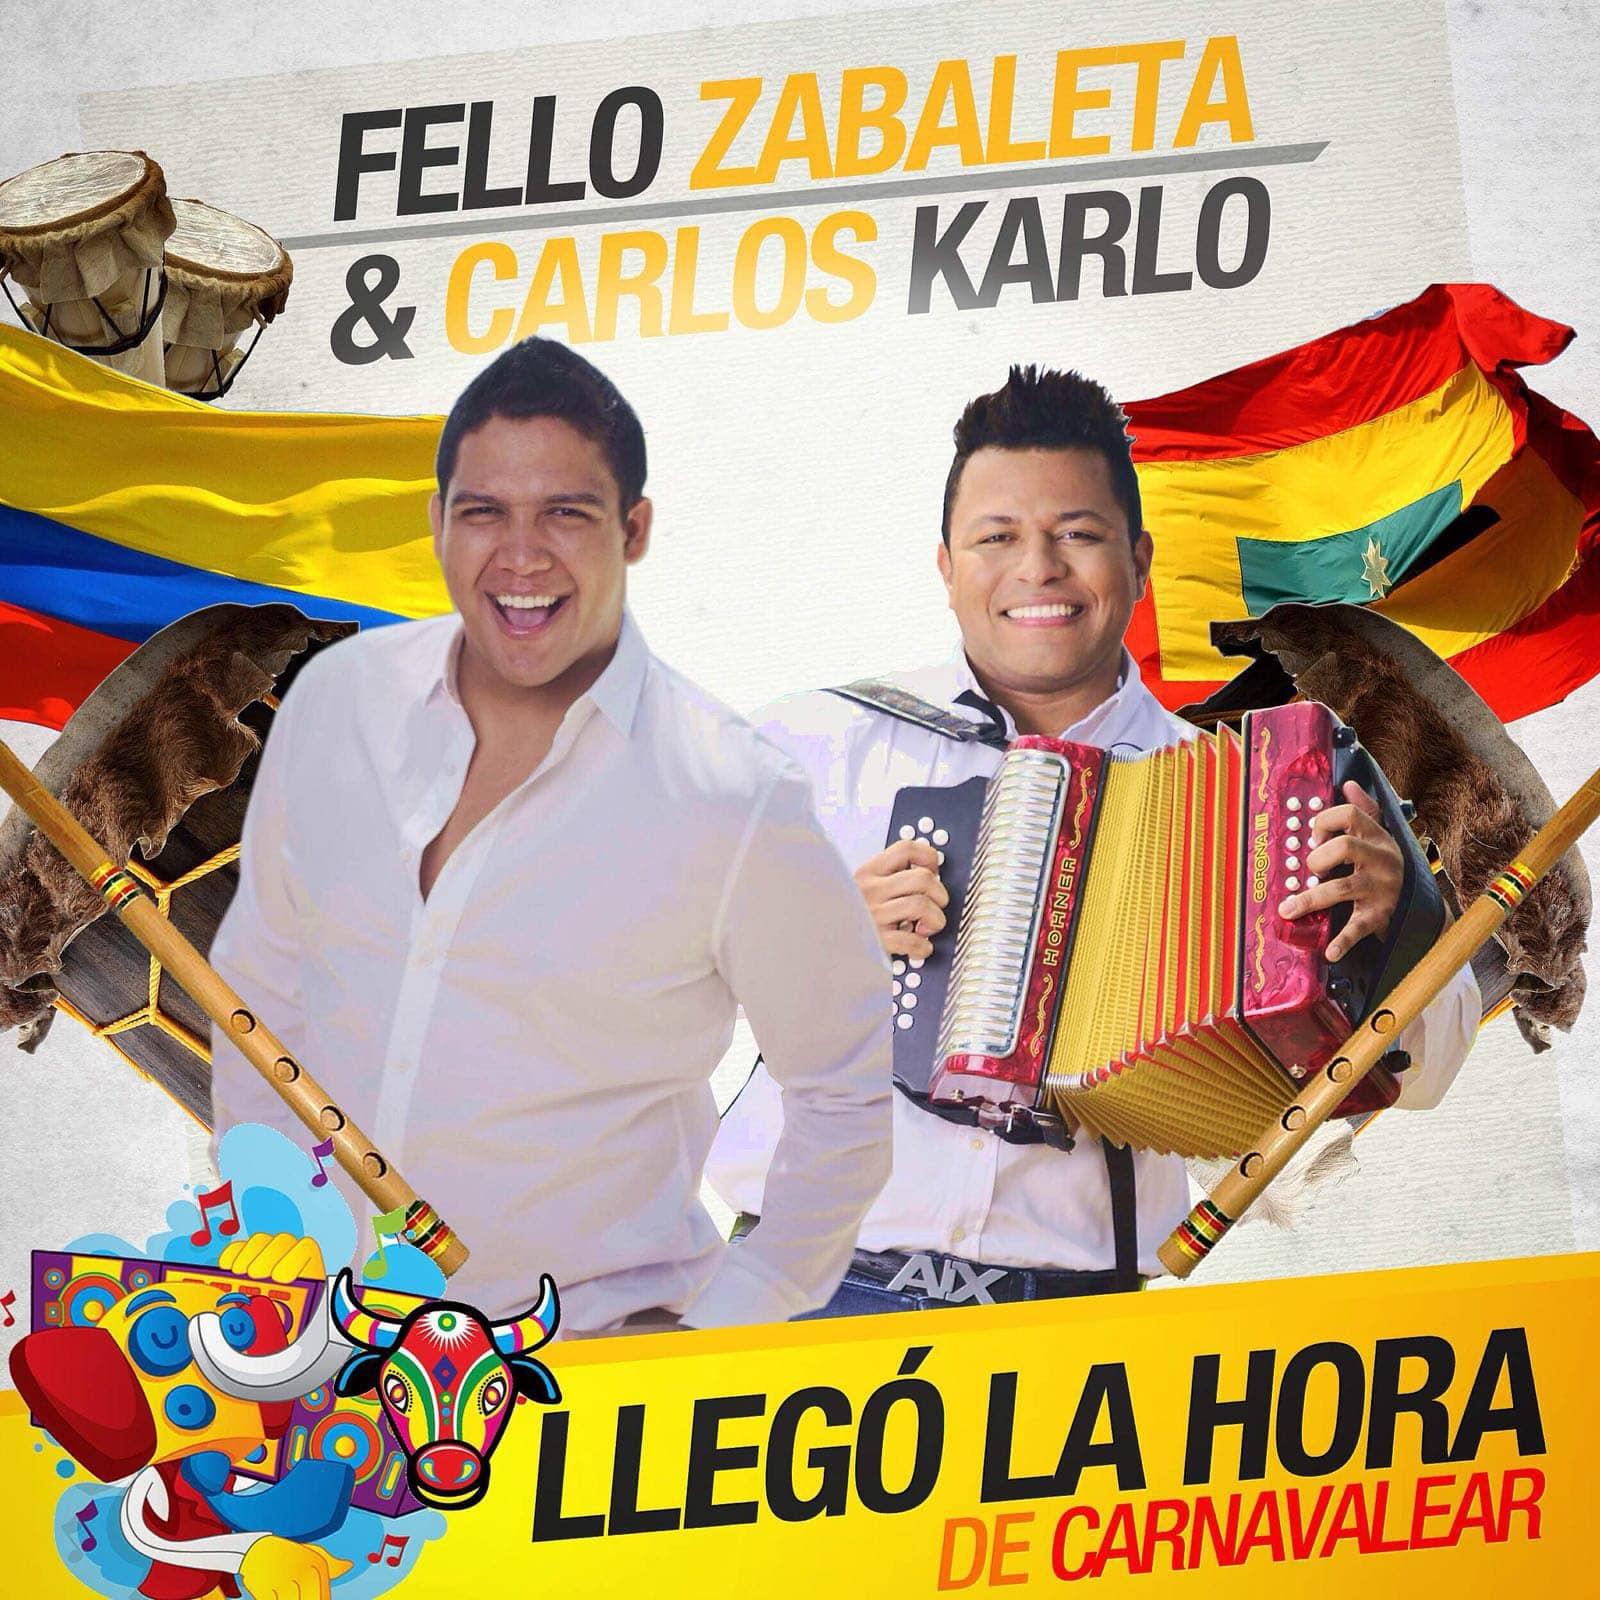 Fello Zabaleta + Carlos Karlo Llegó La Hora De Carnavalear